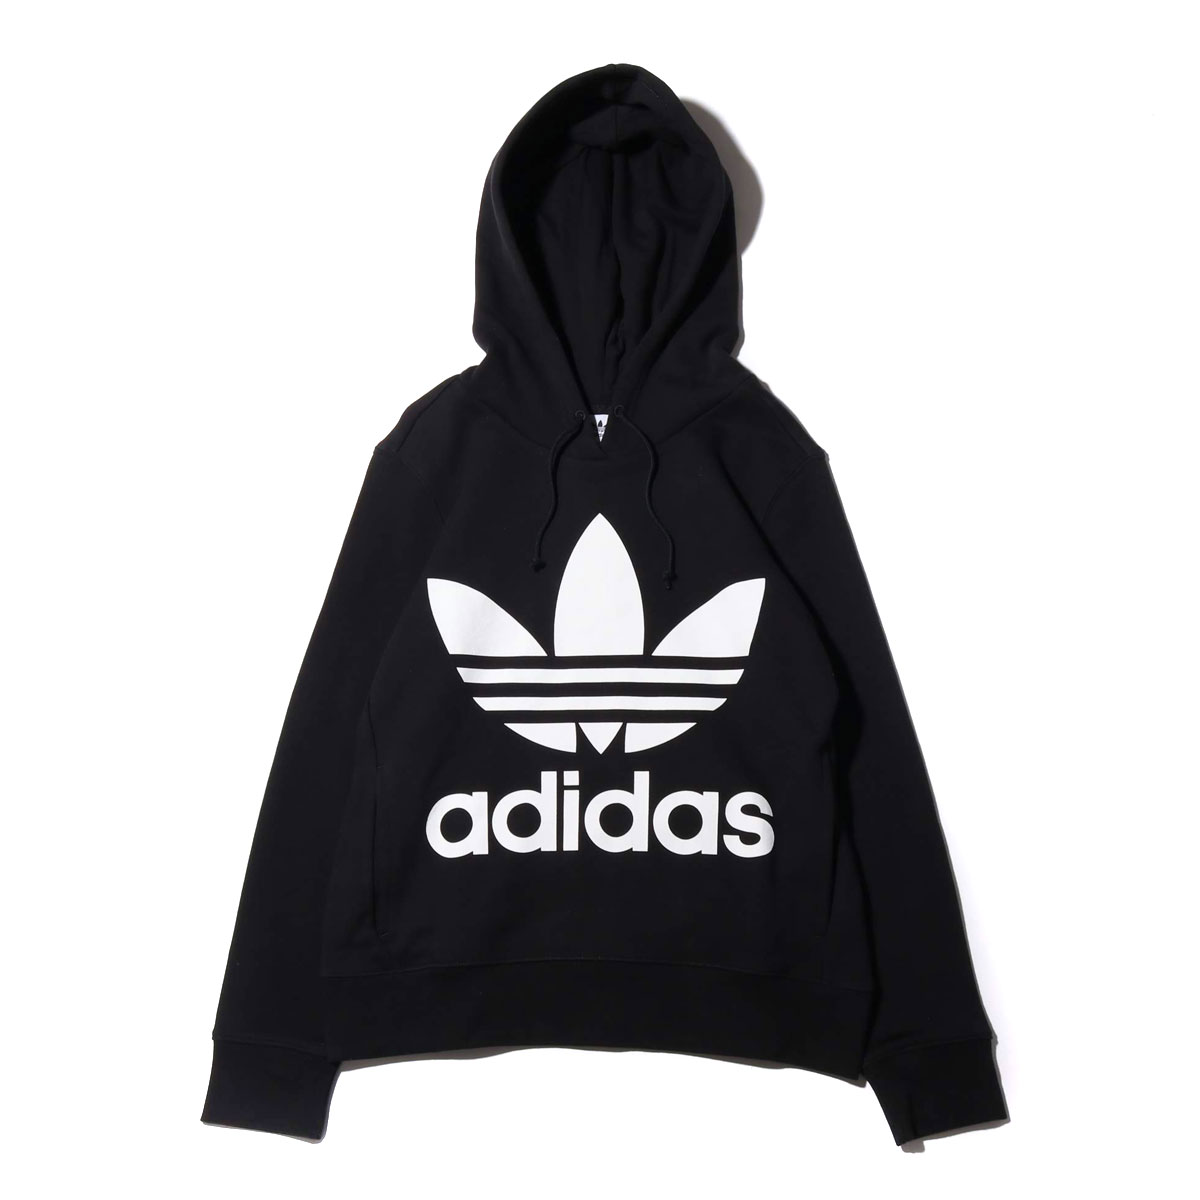 adidas Originals TREFOIL HOODIE(アディダスオリジナルス トレフォイル フーディー)BLACK【レディース パーカー】19SS-I